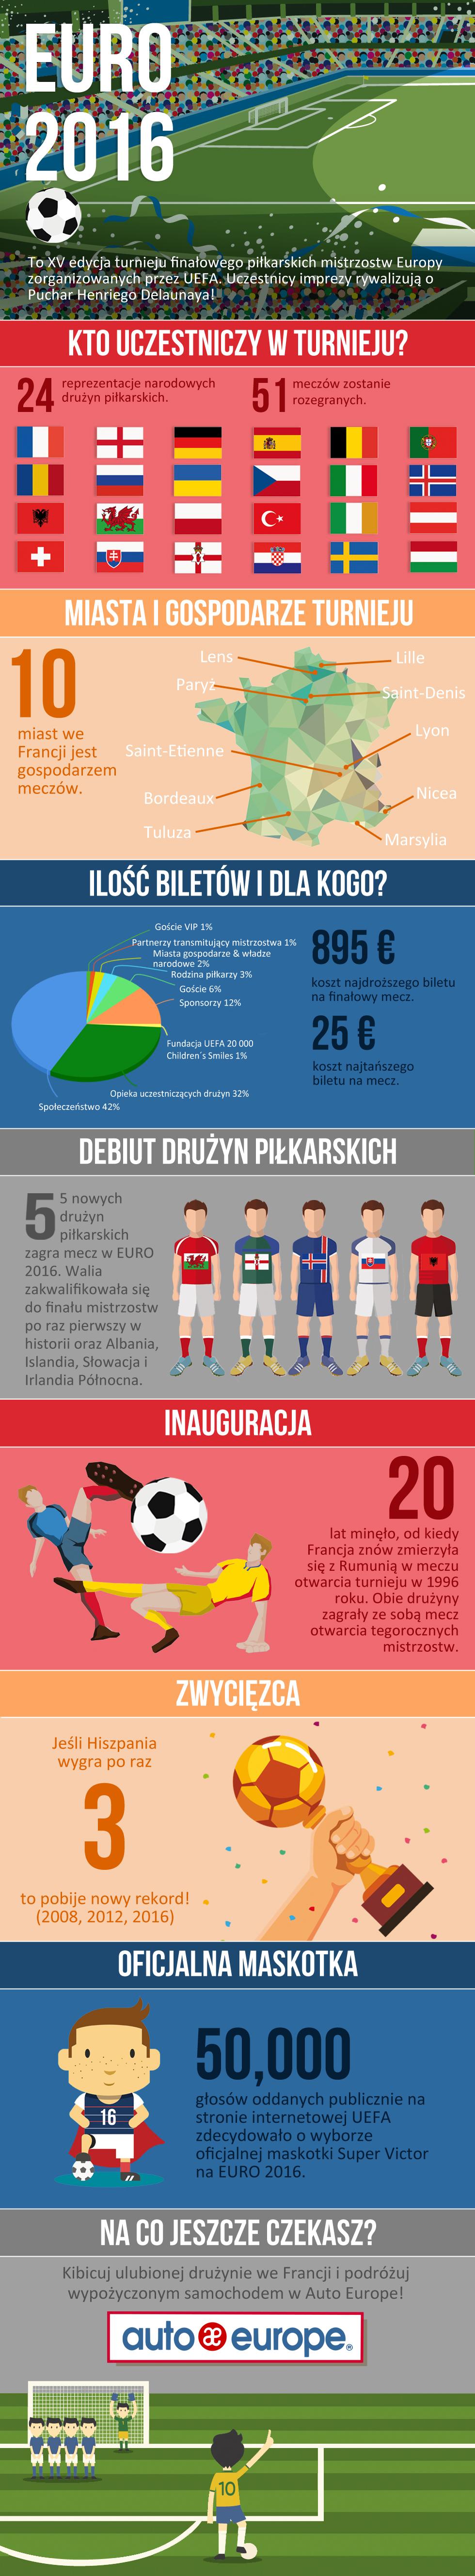 Infografika Euro 2016 Francja